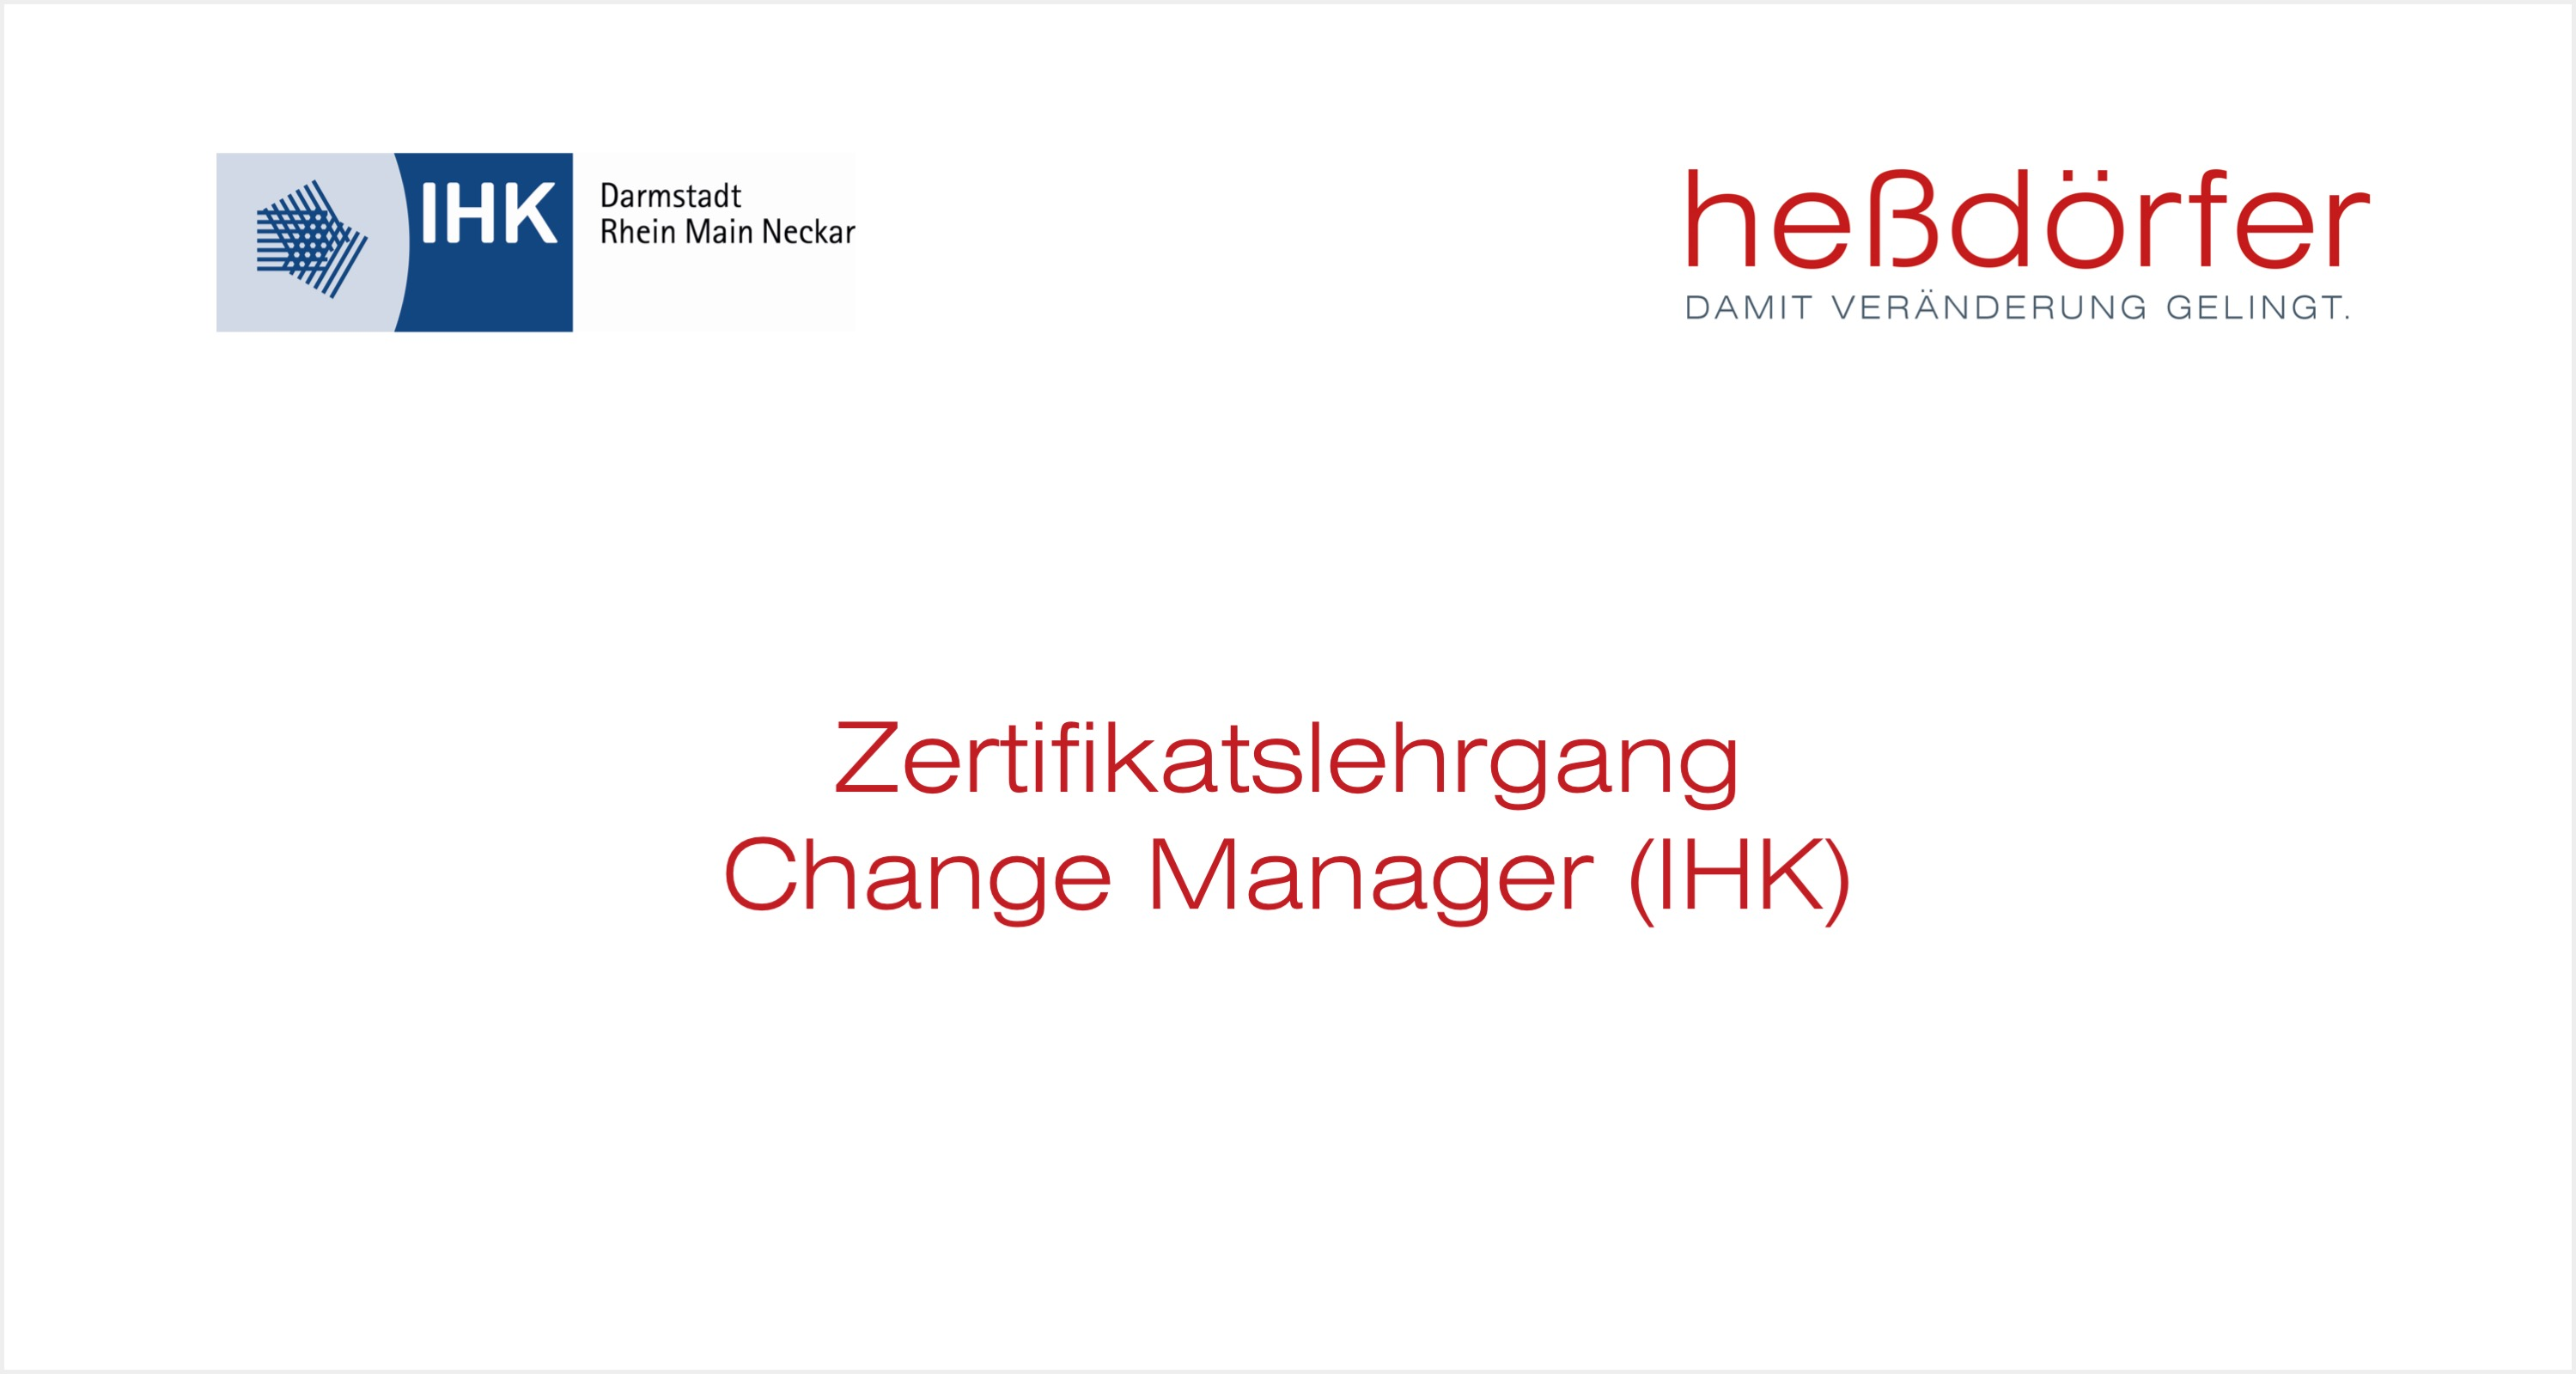 Zertifikatslehrgang - Change Manager (IHK)